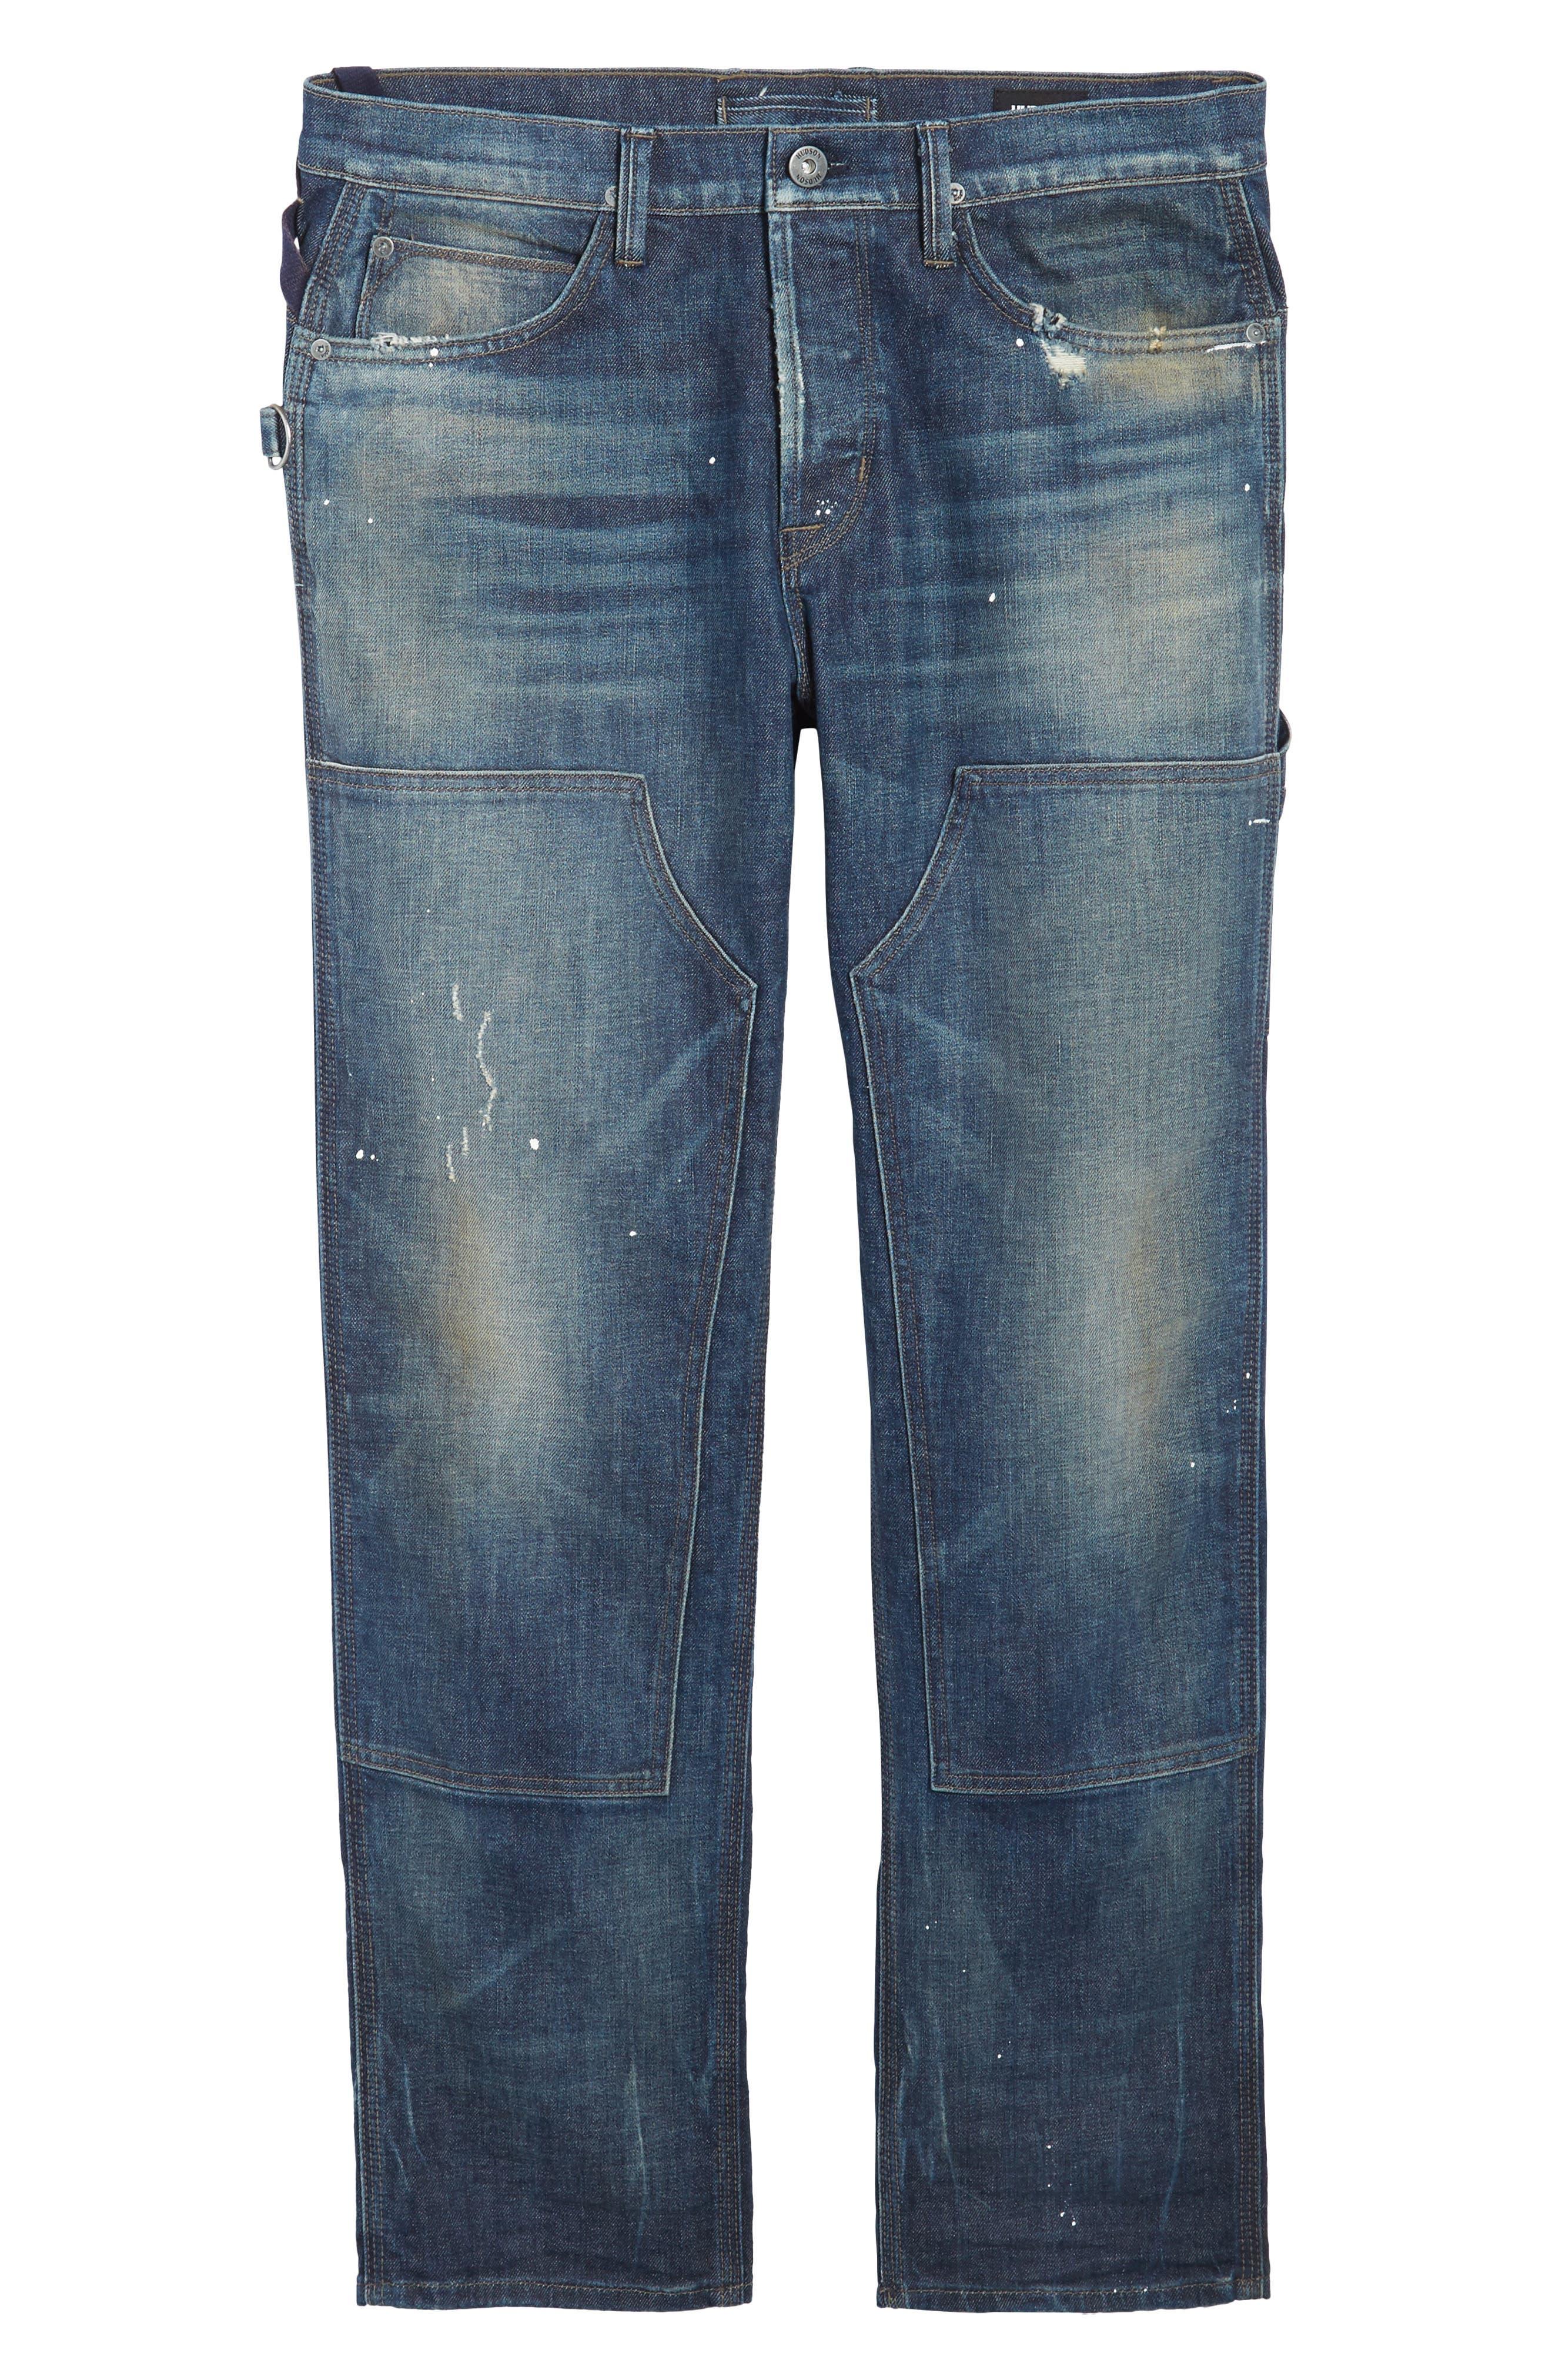 Hunter Straight Fit Jeans,                             Alternate thumbnail 6, color,                             Virus